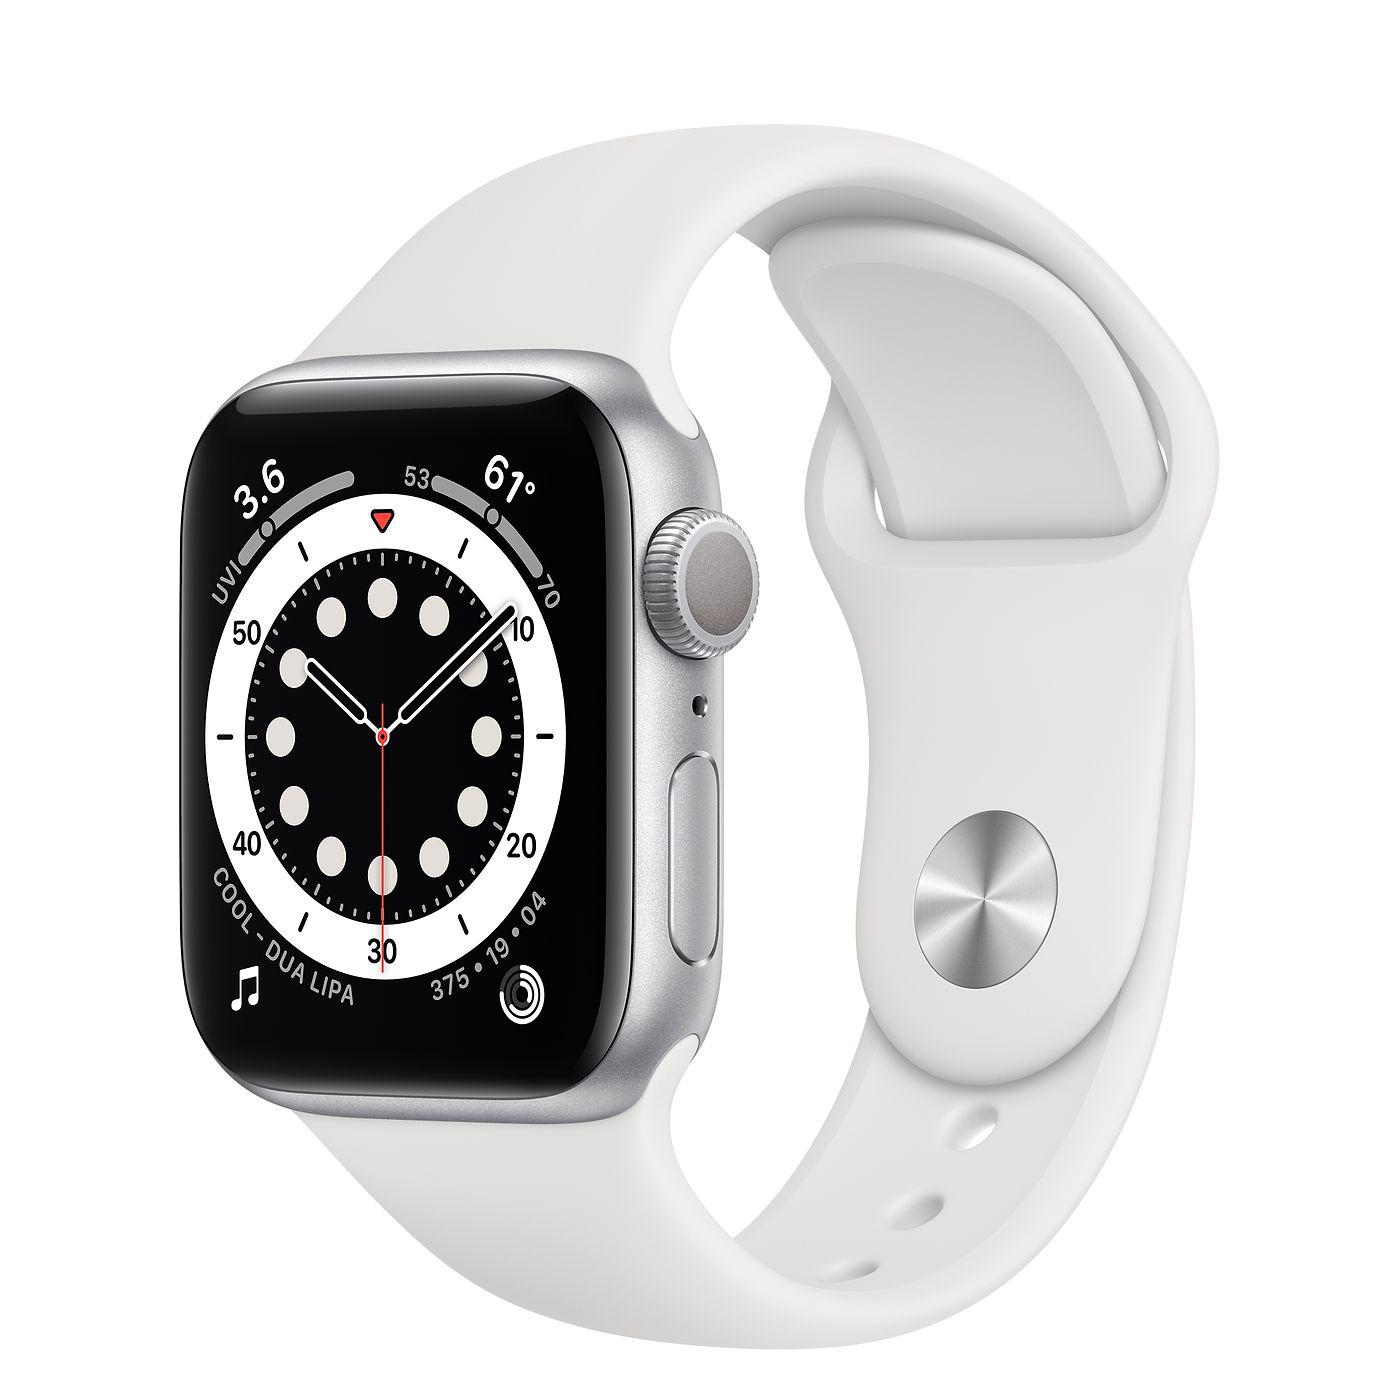 Apple 2020년 애플워치 6 GPS 40mm 레귤러, 실버 알루미늄(케이스), 화이트(스포츠 밴드)